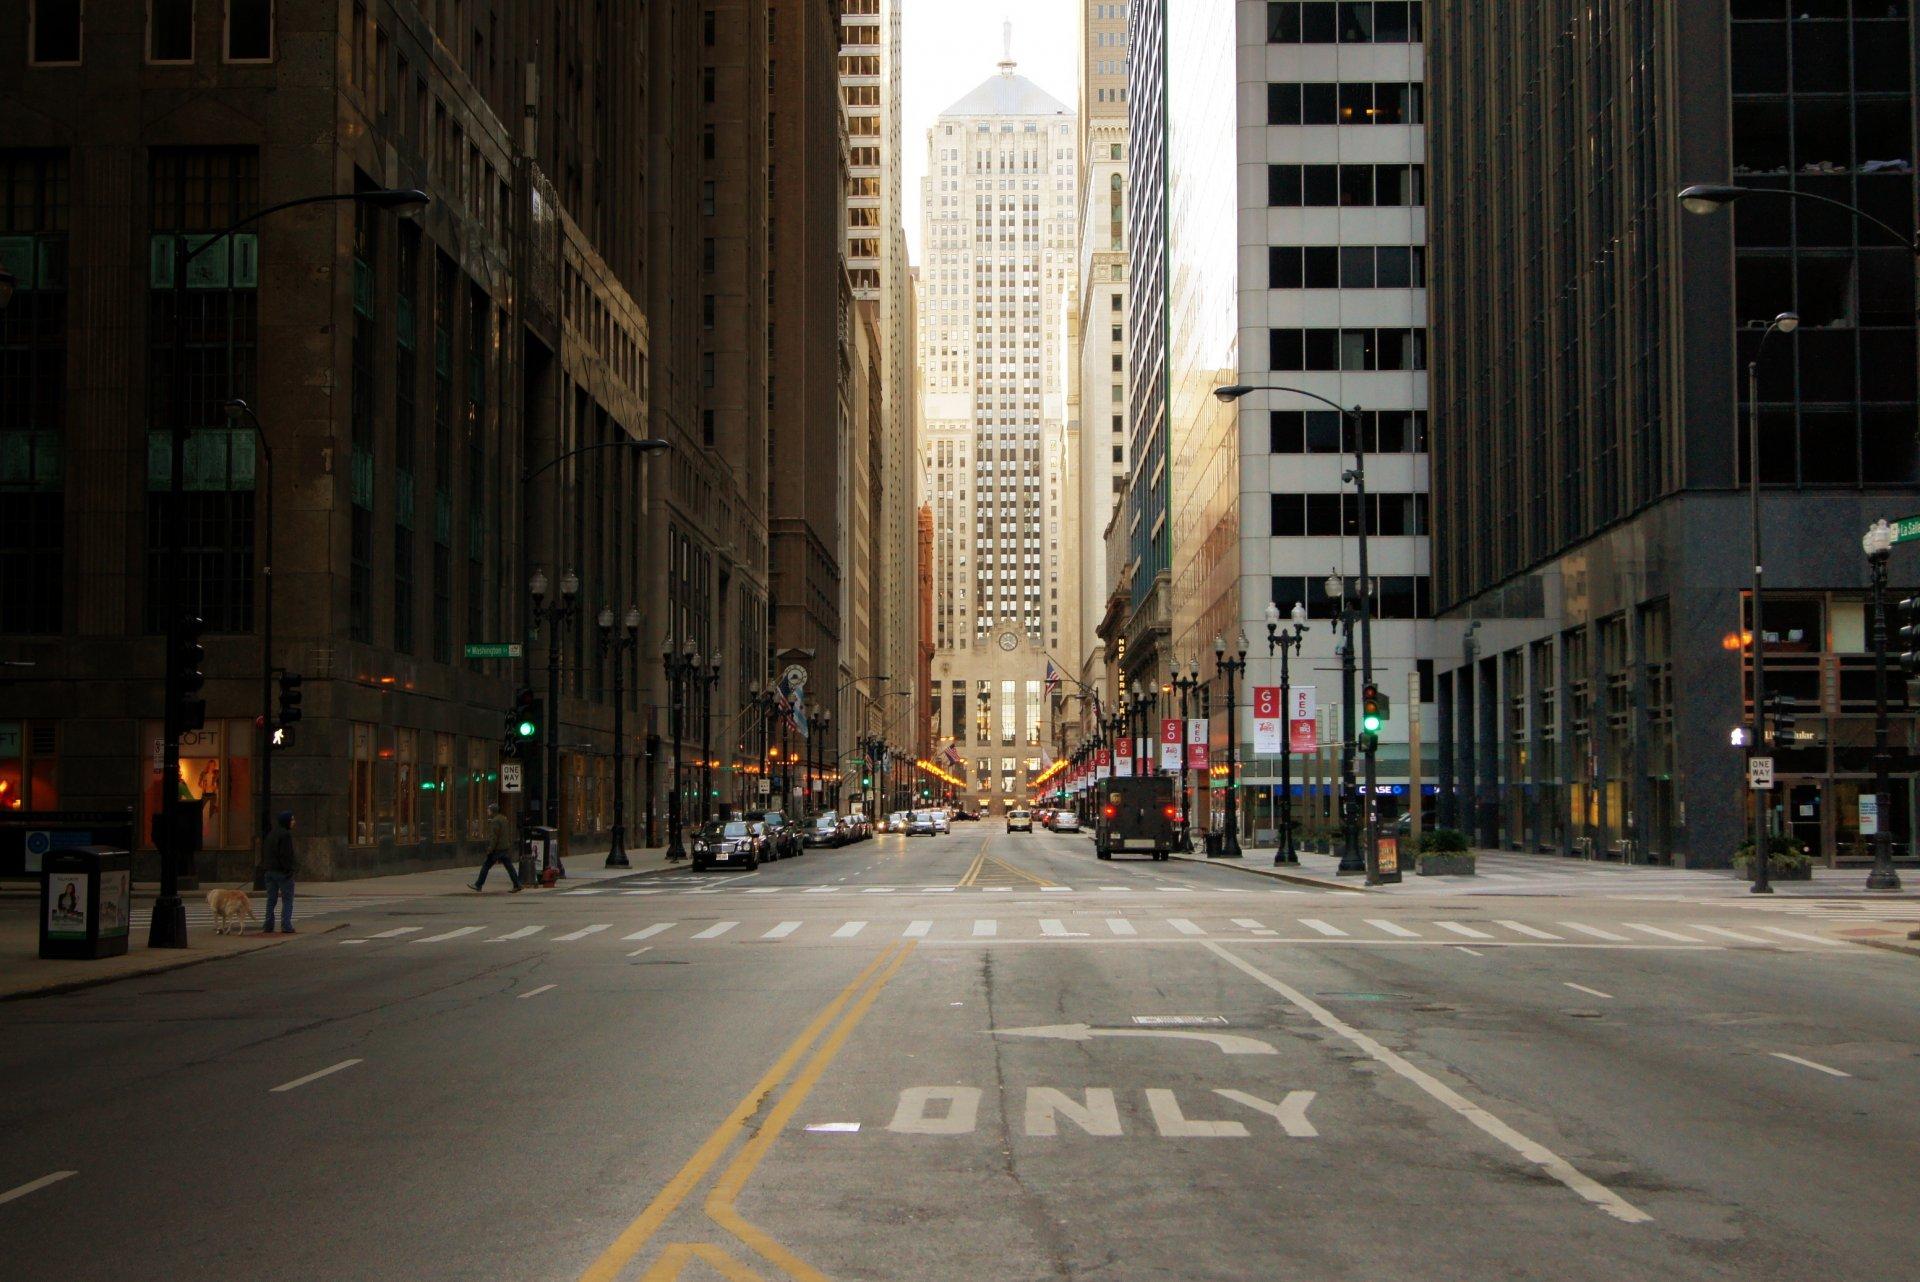 америка улицы фото